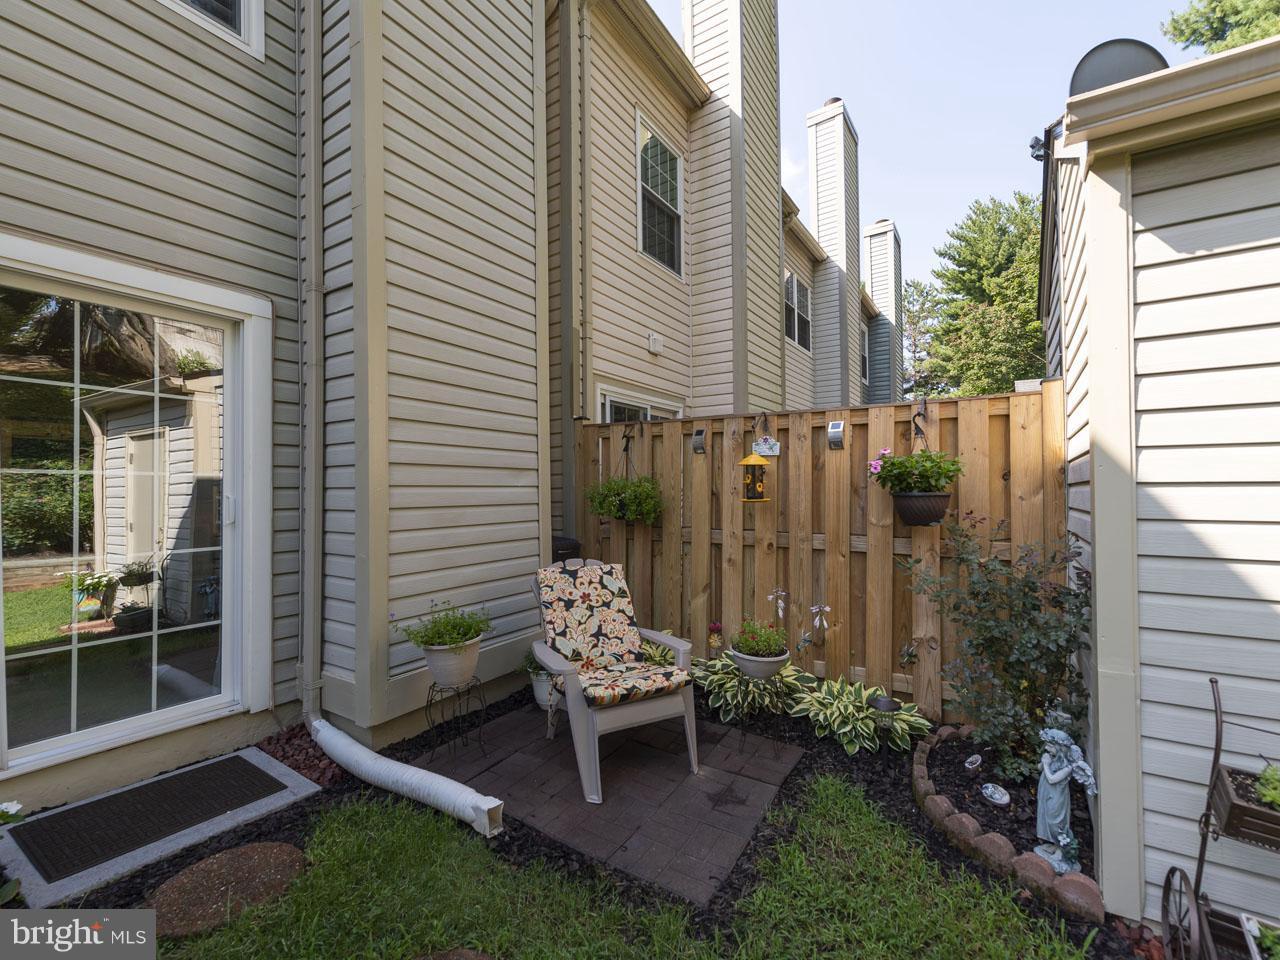 1002640508-300537941451-2021-07-22-05-00-38     Pinecrest   Alexandria Delaware Real Estate For Sale   MLS# 1002640508  - Best of Northern Virginia